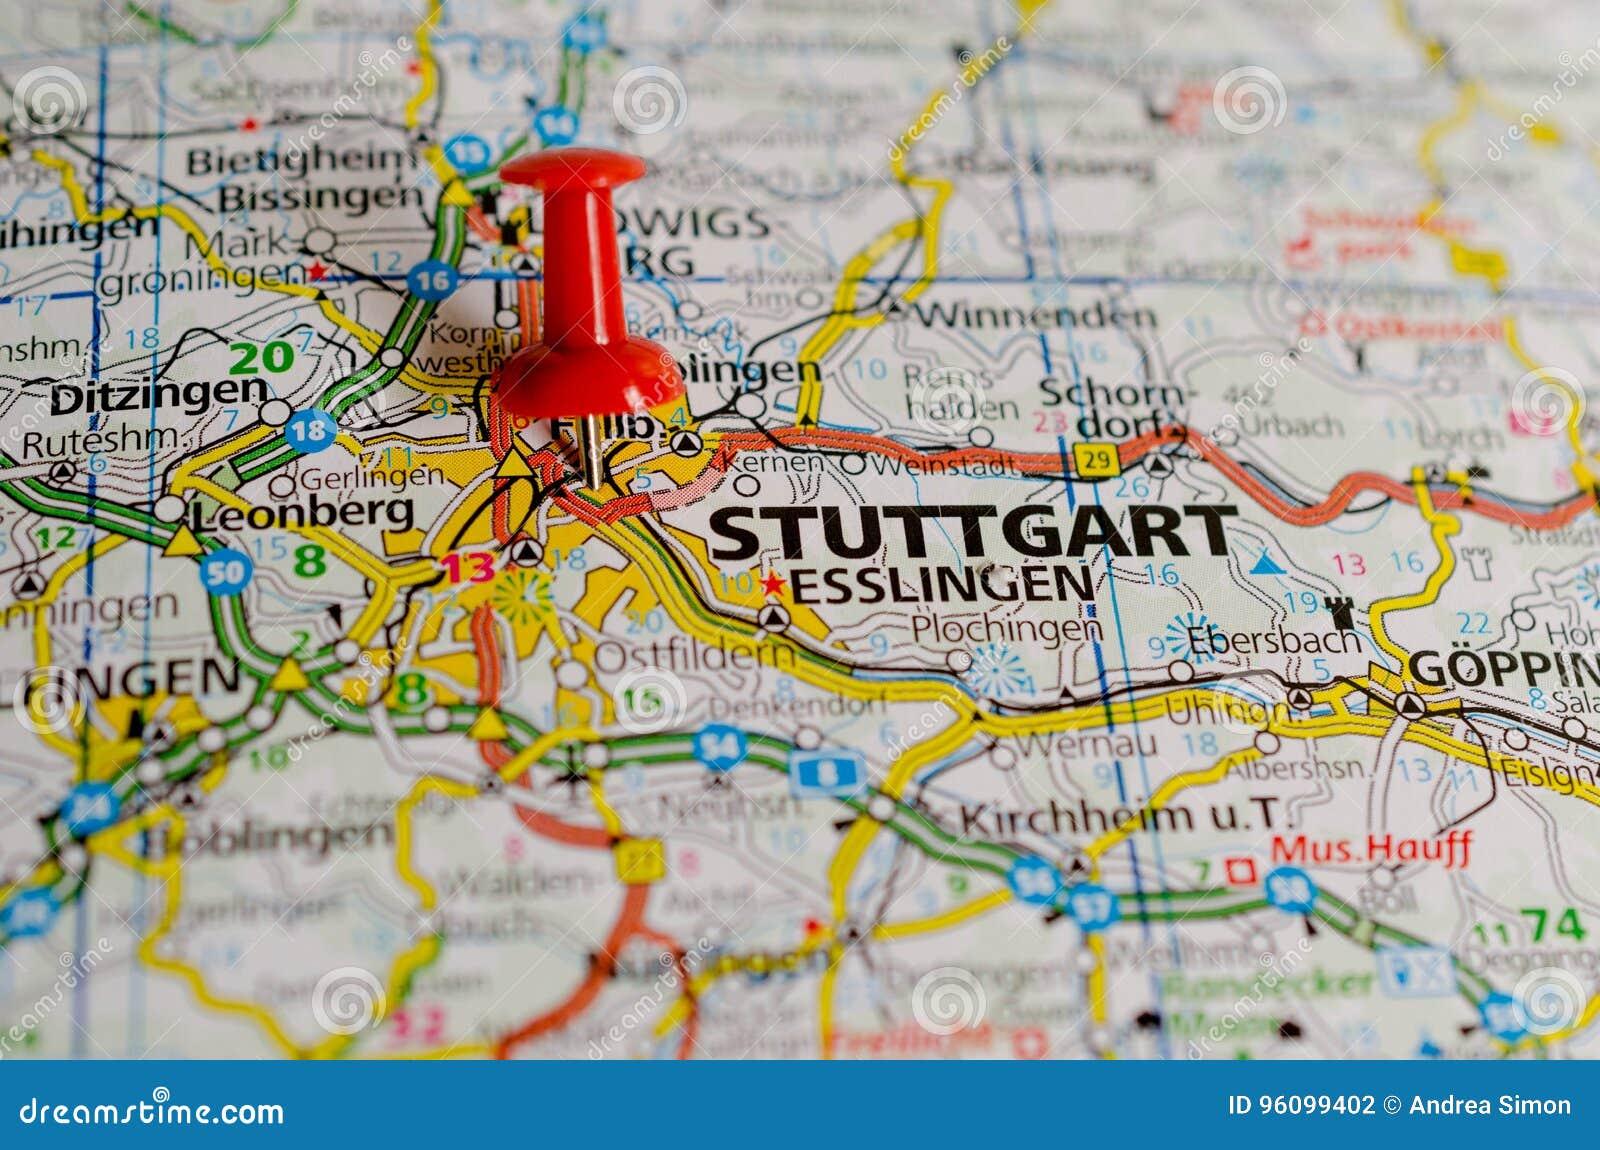 stuttgart on map stock photo image of german luxury. Black Bedroom Furniture Sets. Home Design Ideas